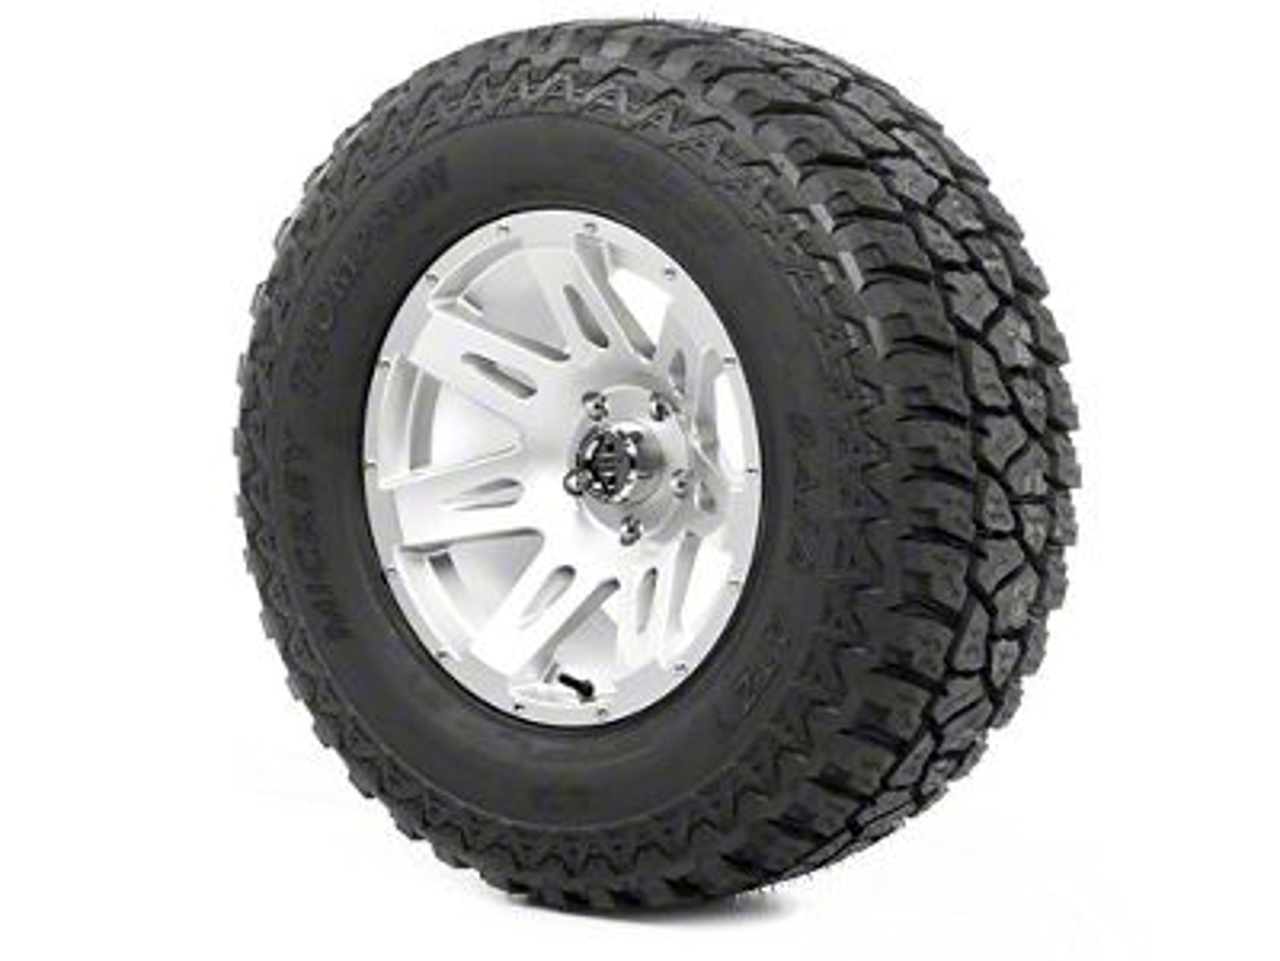 Rugged Ridge XHD Wheel 17x9 Silver and Mickey Thompson ATZ P3 315/70R17 Tire (07-18 Jeep Wrangler JK)